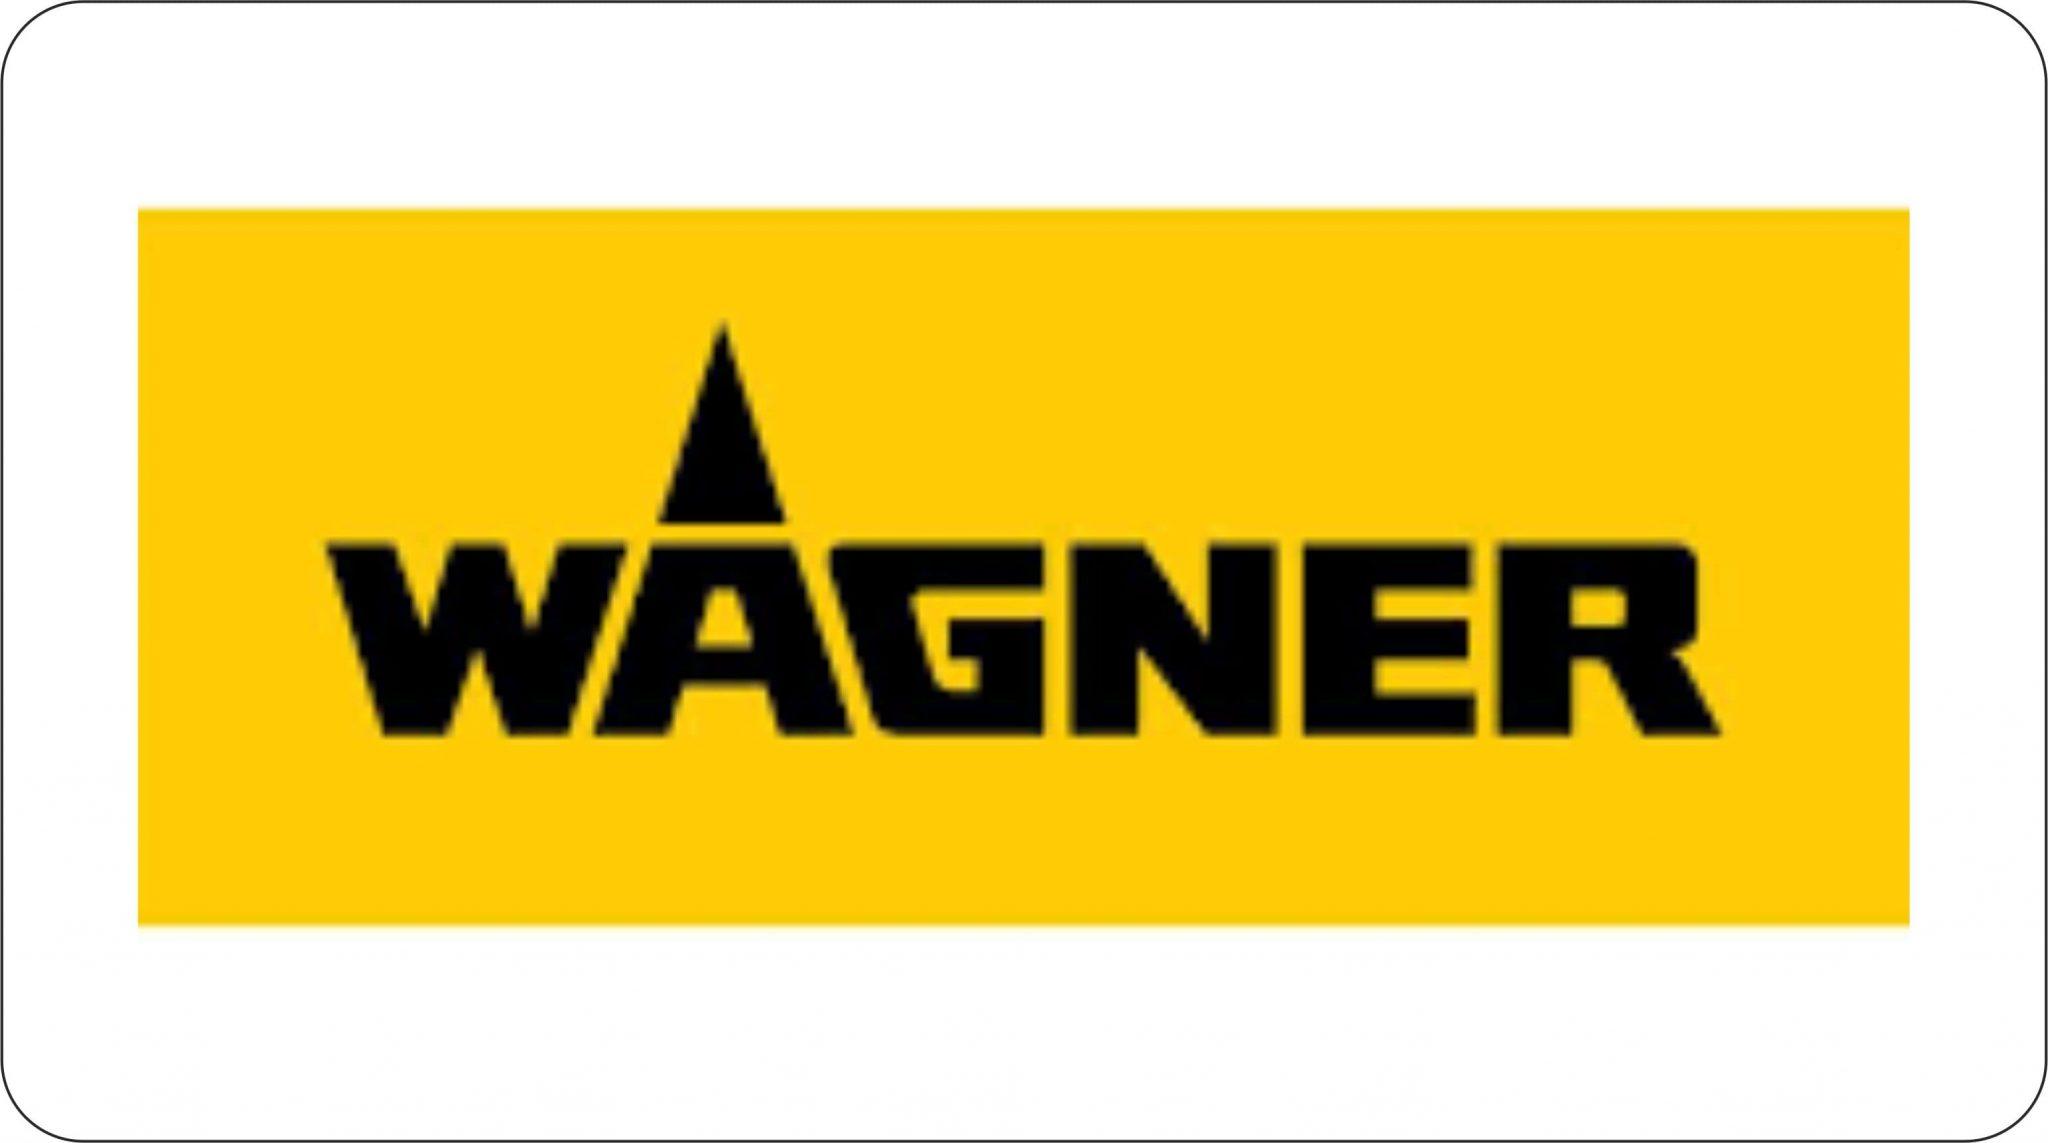 WAGNER-min